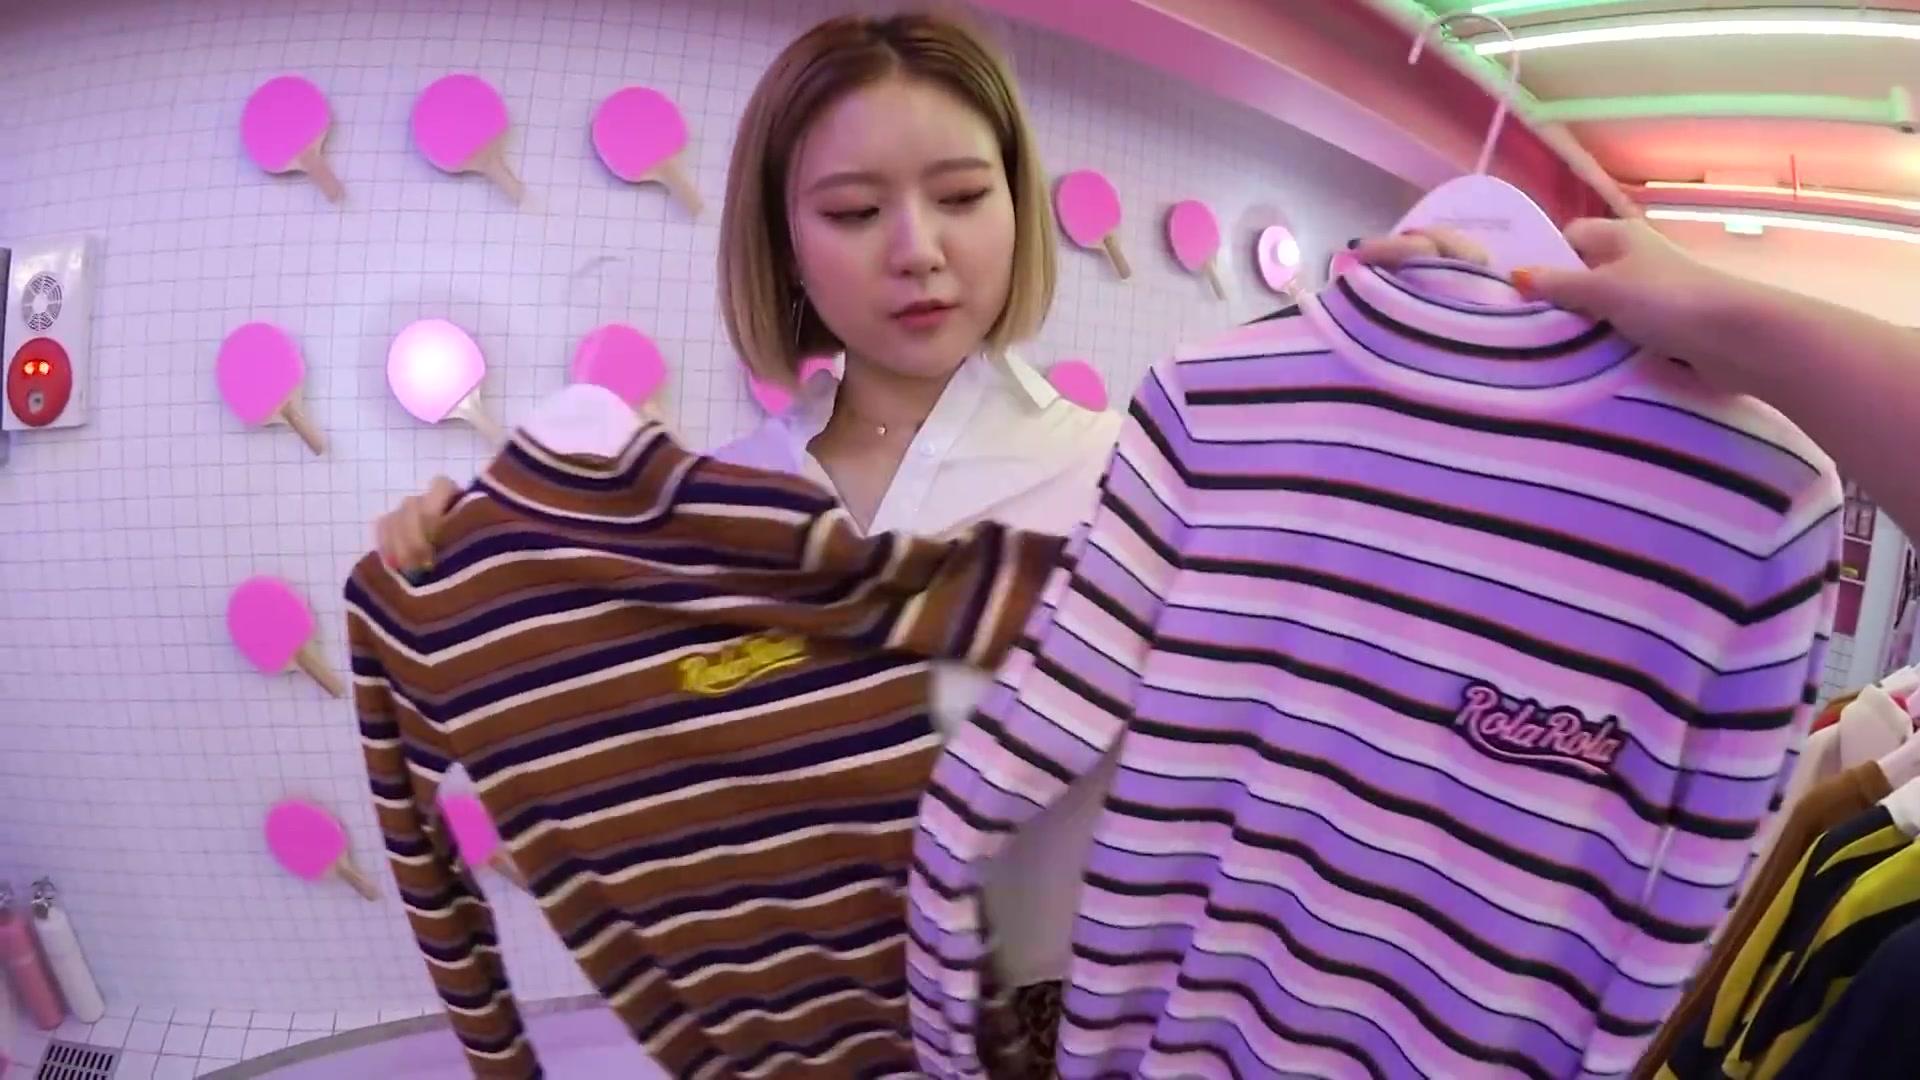 Q2Han Episode 47: Shopping in Korea - Winter Outfits at Rolarola 2018 (Hongdae) [Q2HAN]